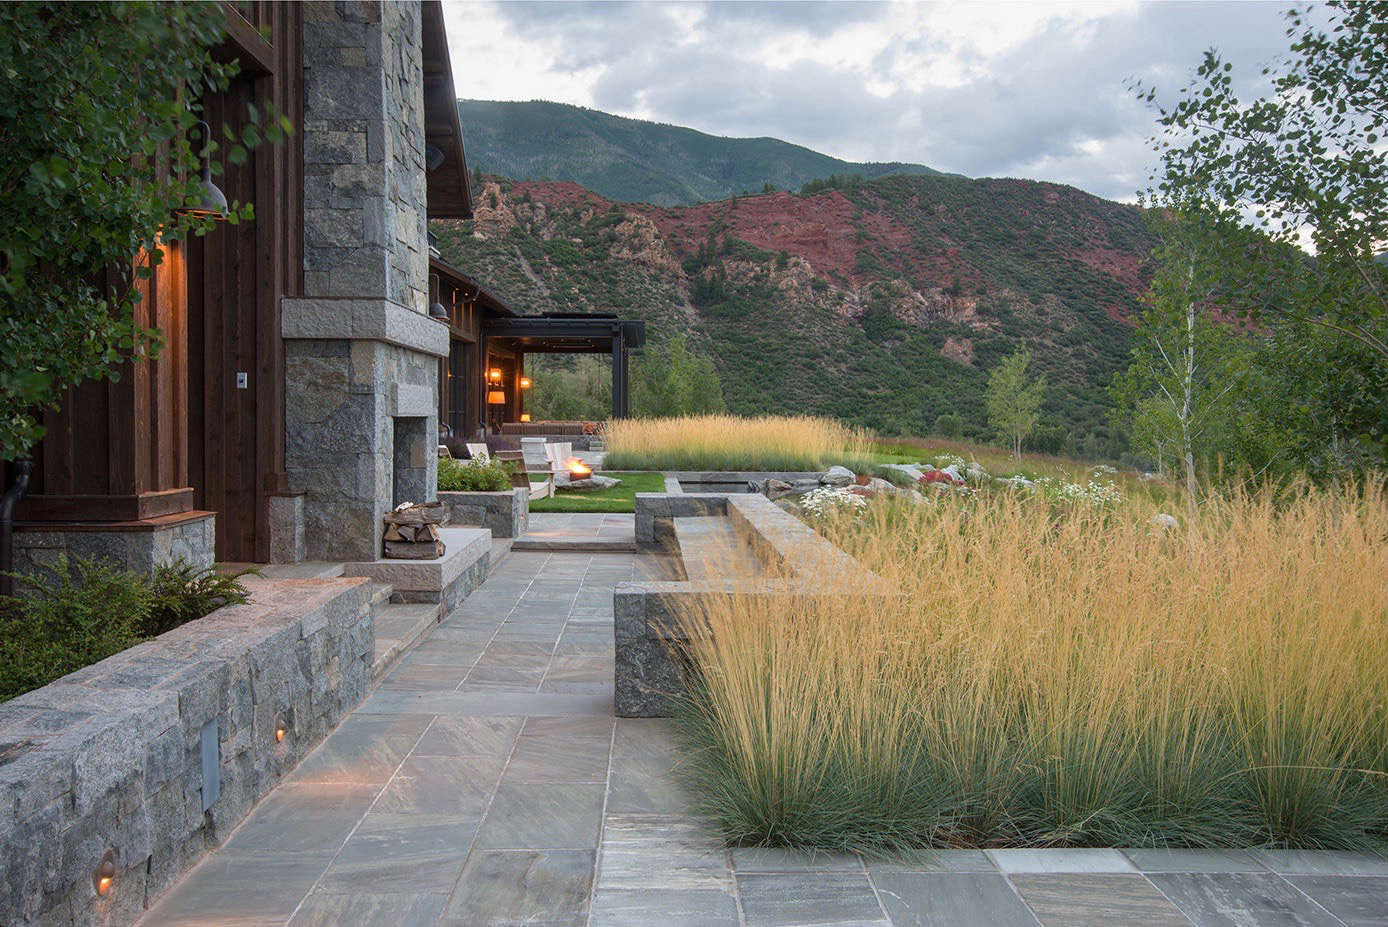 dbx-ranch-asla-aspen-design-workshop-11